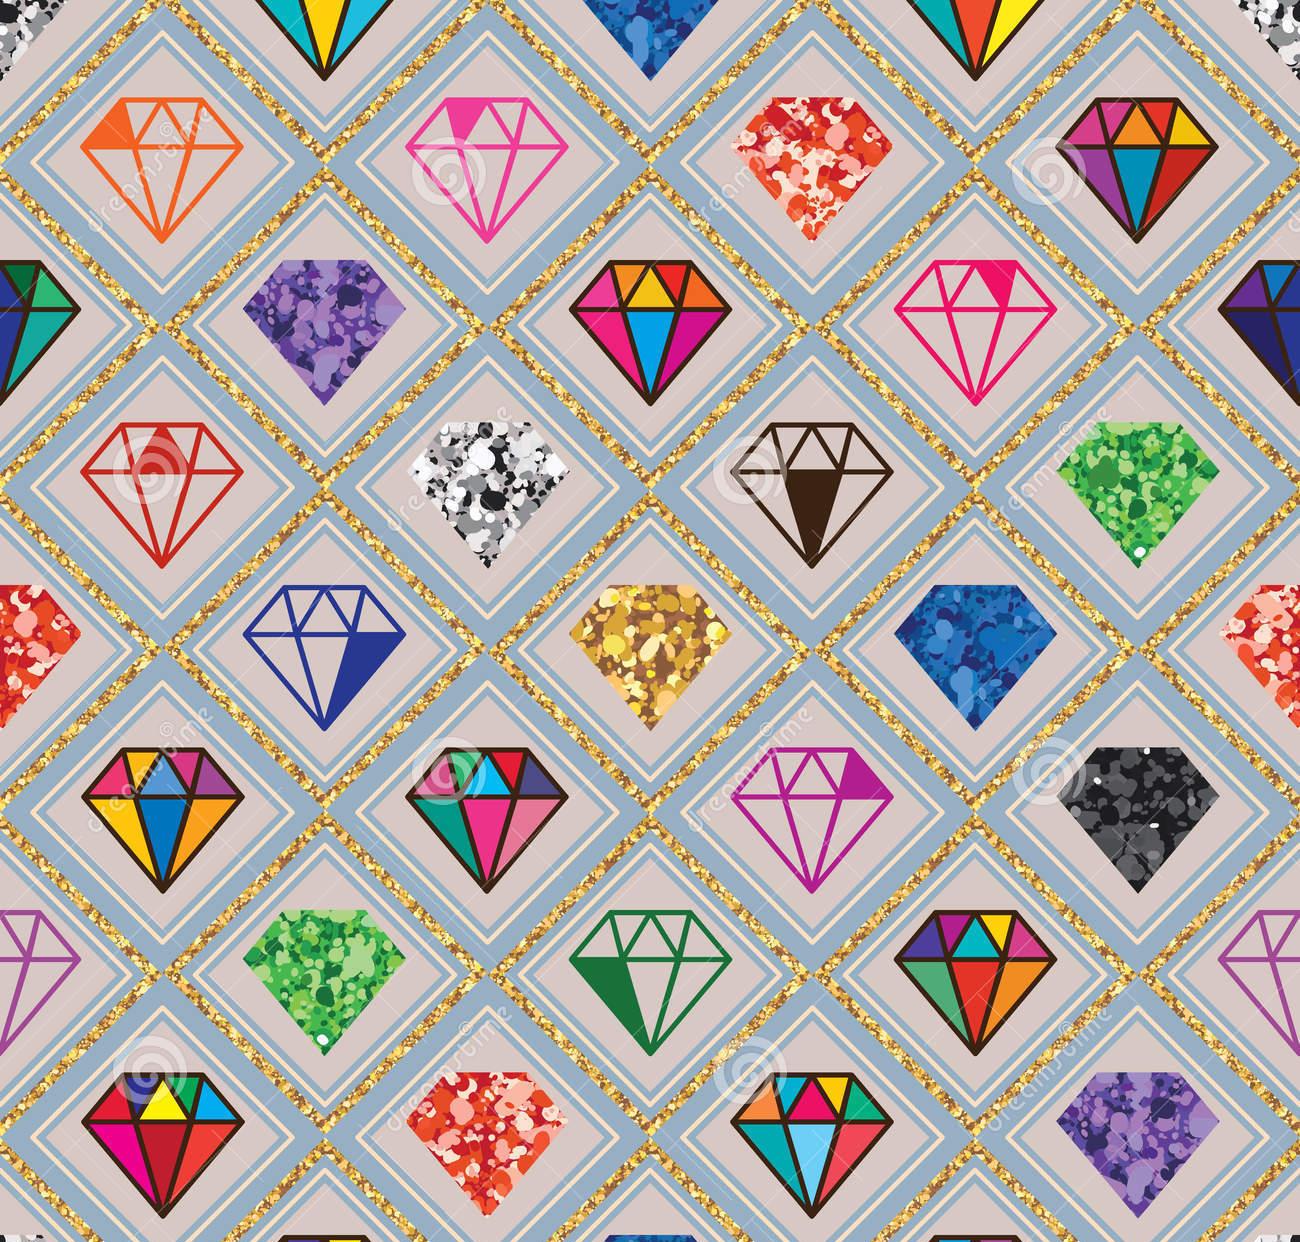 glitter style and pattern